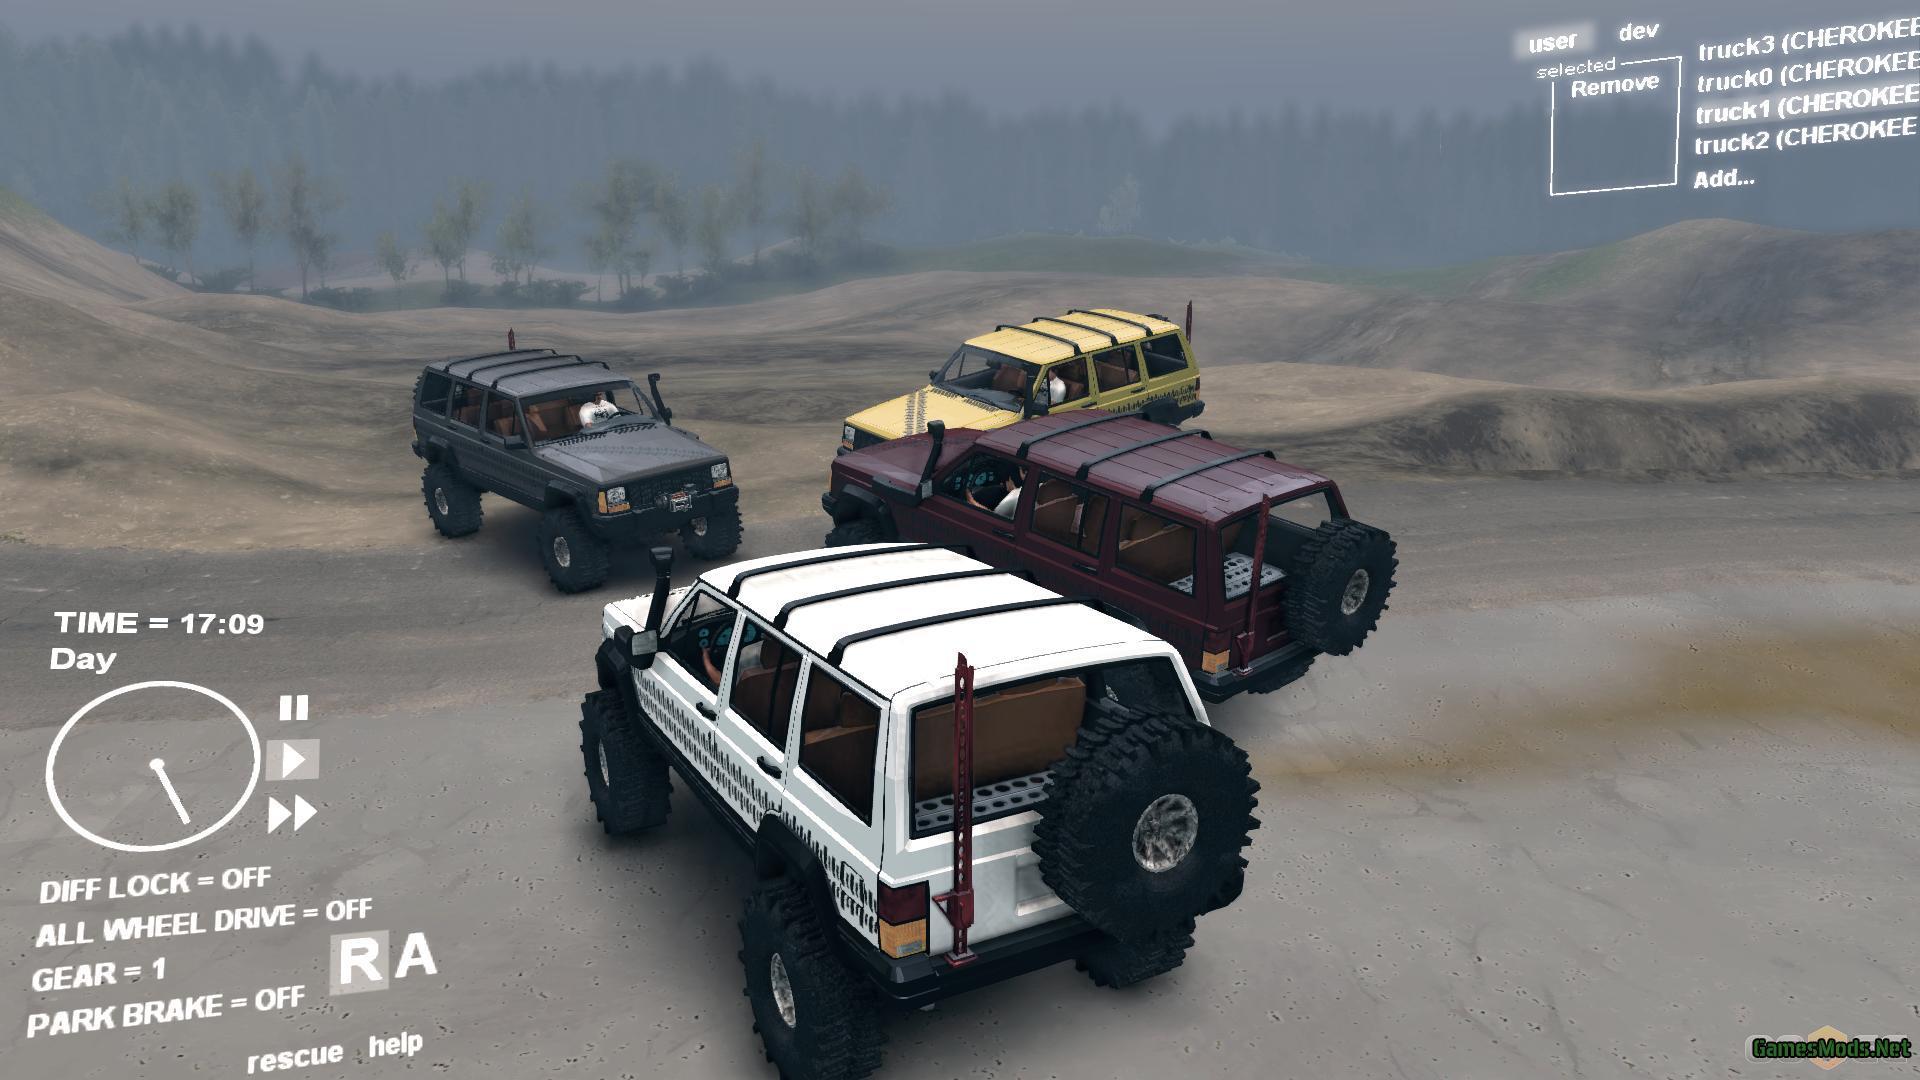 Jeep Cherokee Xj >> Jeep Cherokee XJ » GamesMods.net - FS17, CNC, FS15, ETS 2 mods